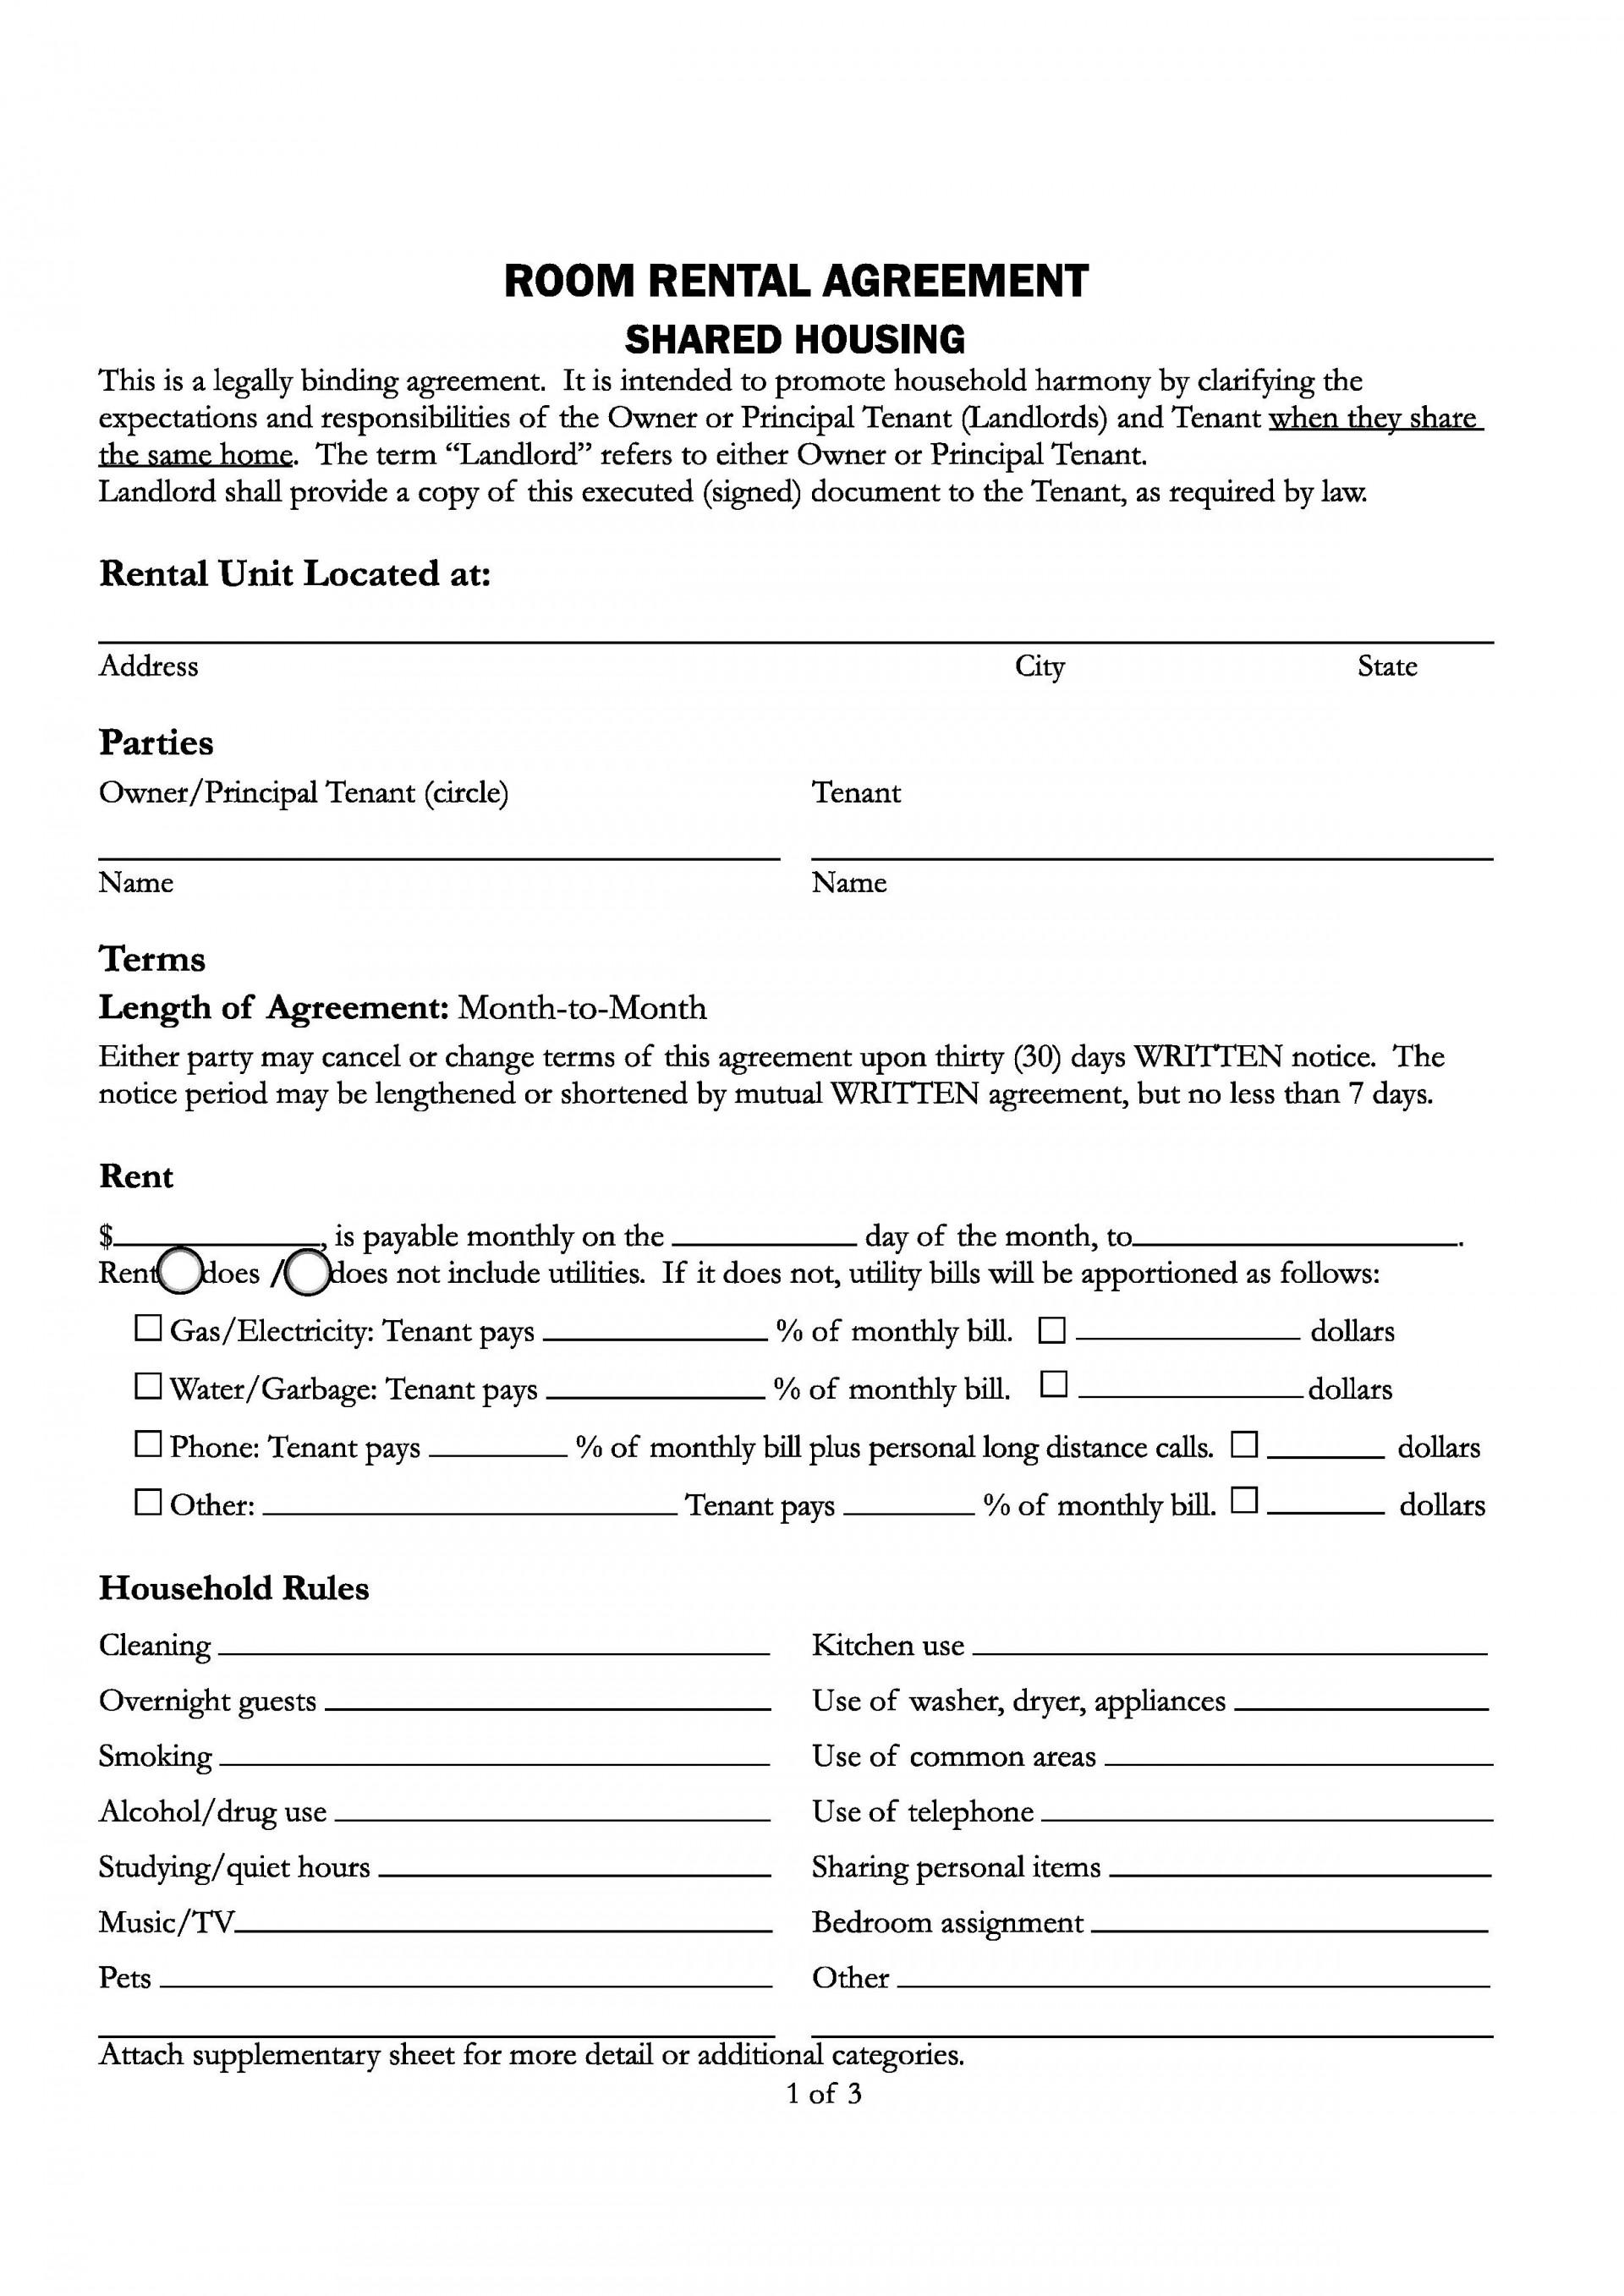 009 Impressive Room Rental Agreement Simple Form Design  Template Word Doc Rent Format In Free Uk1920